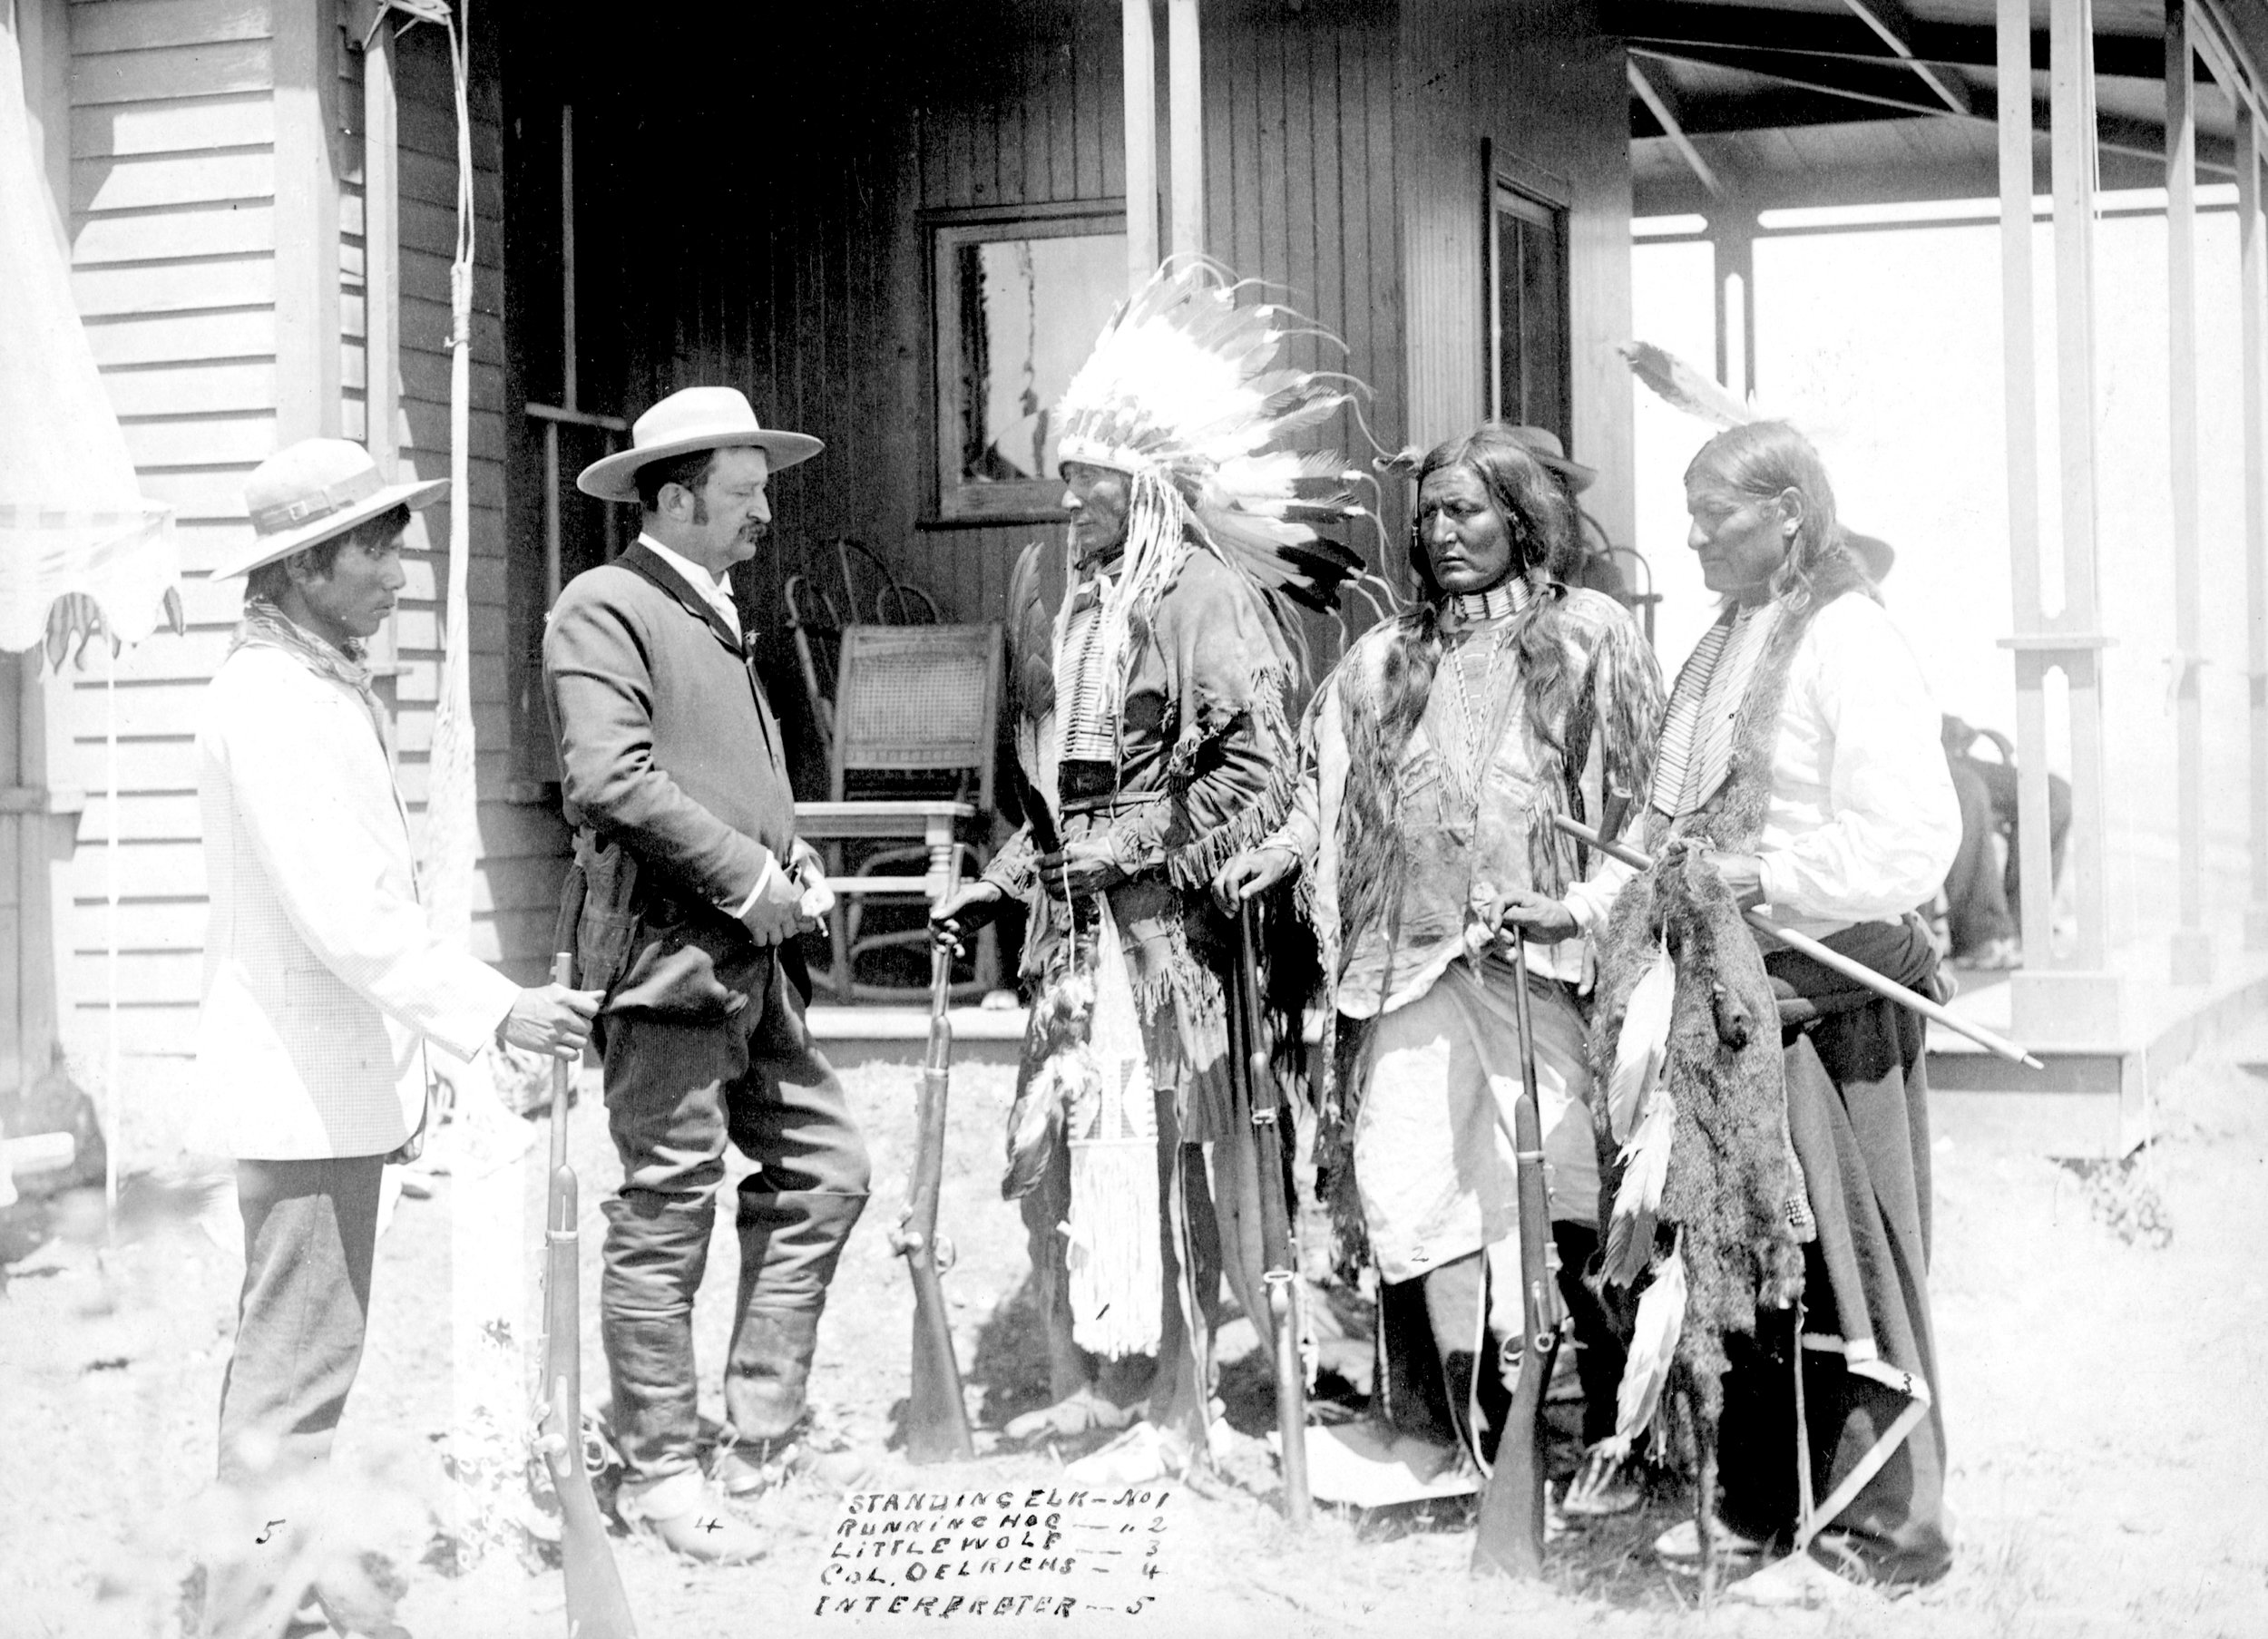 interpreter, colonel, and elder Indians